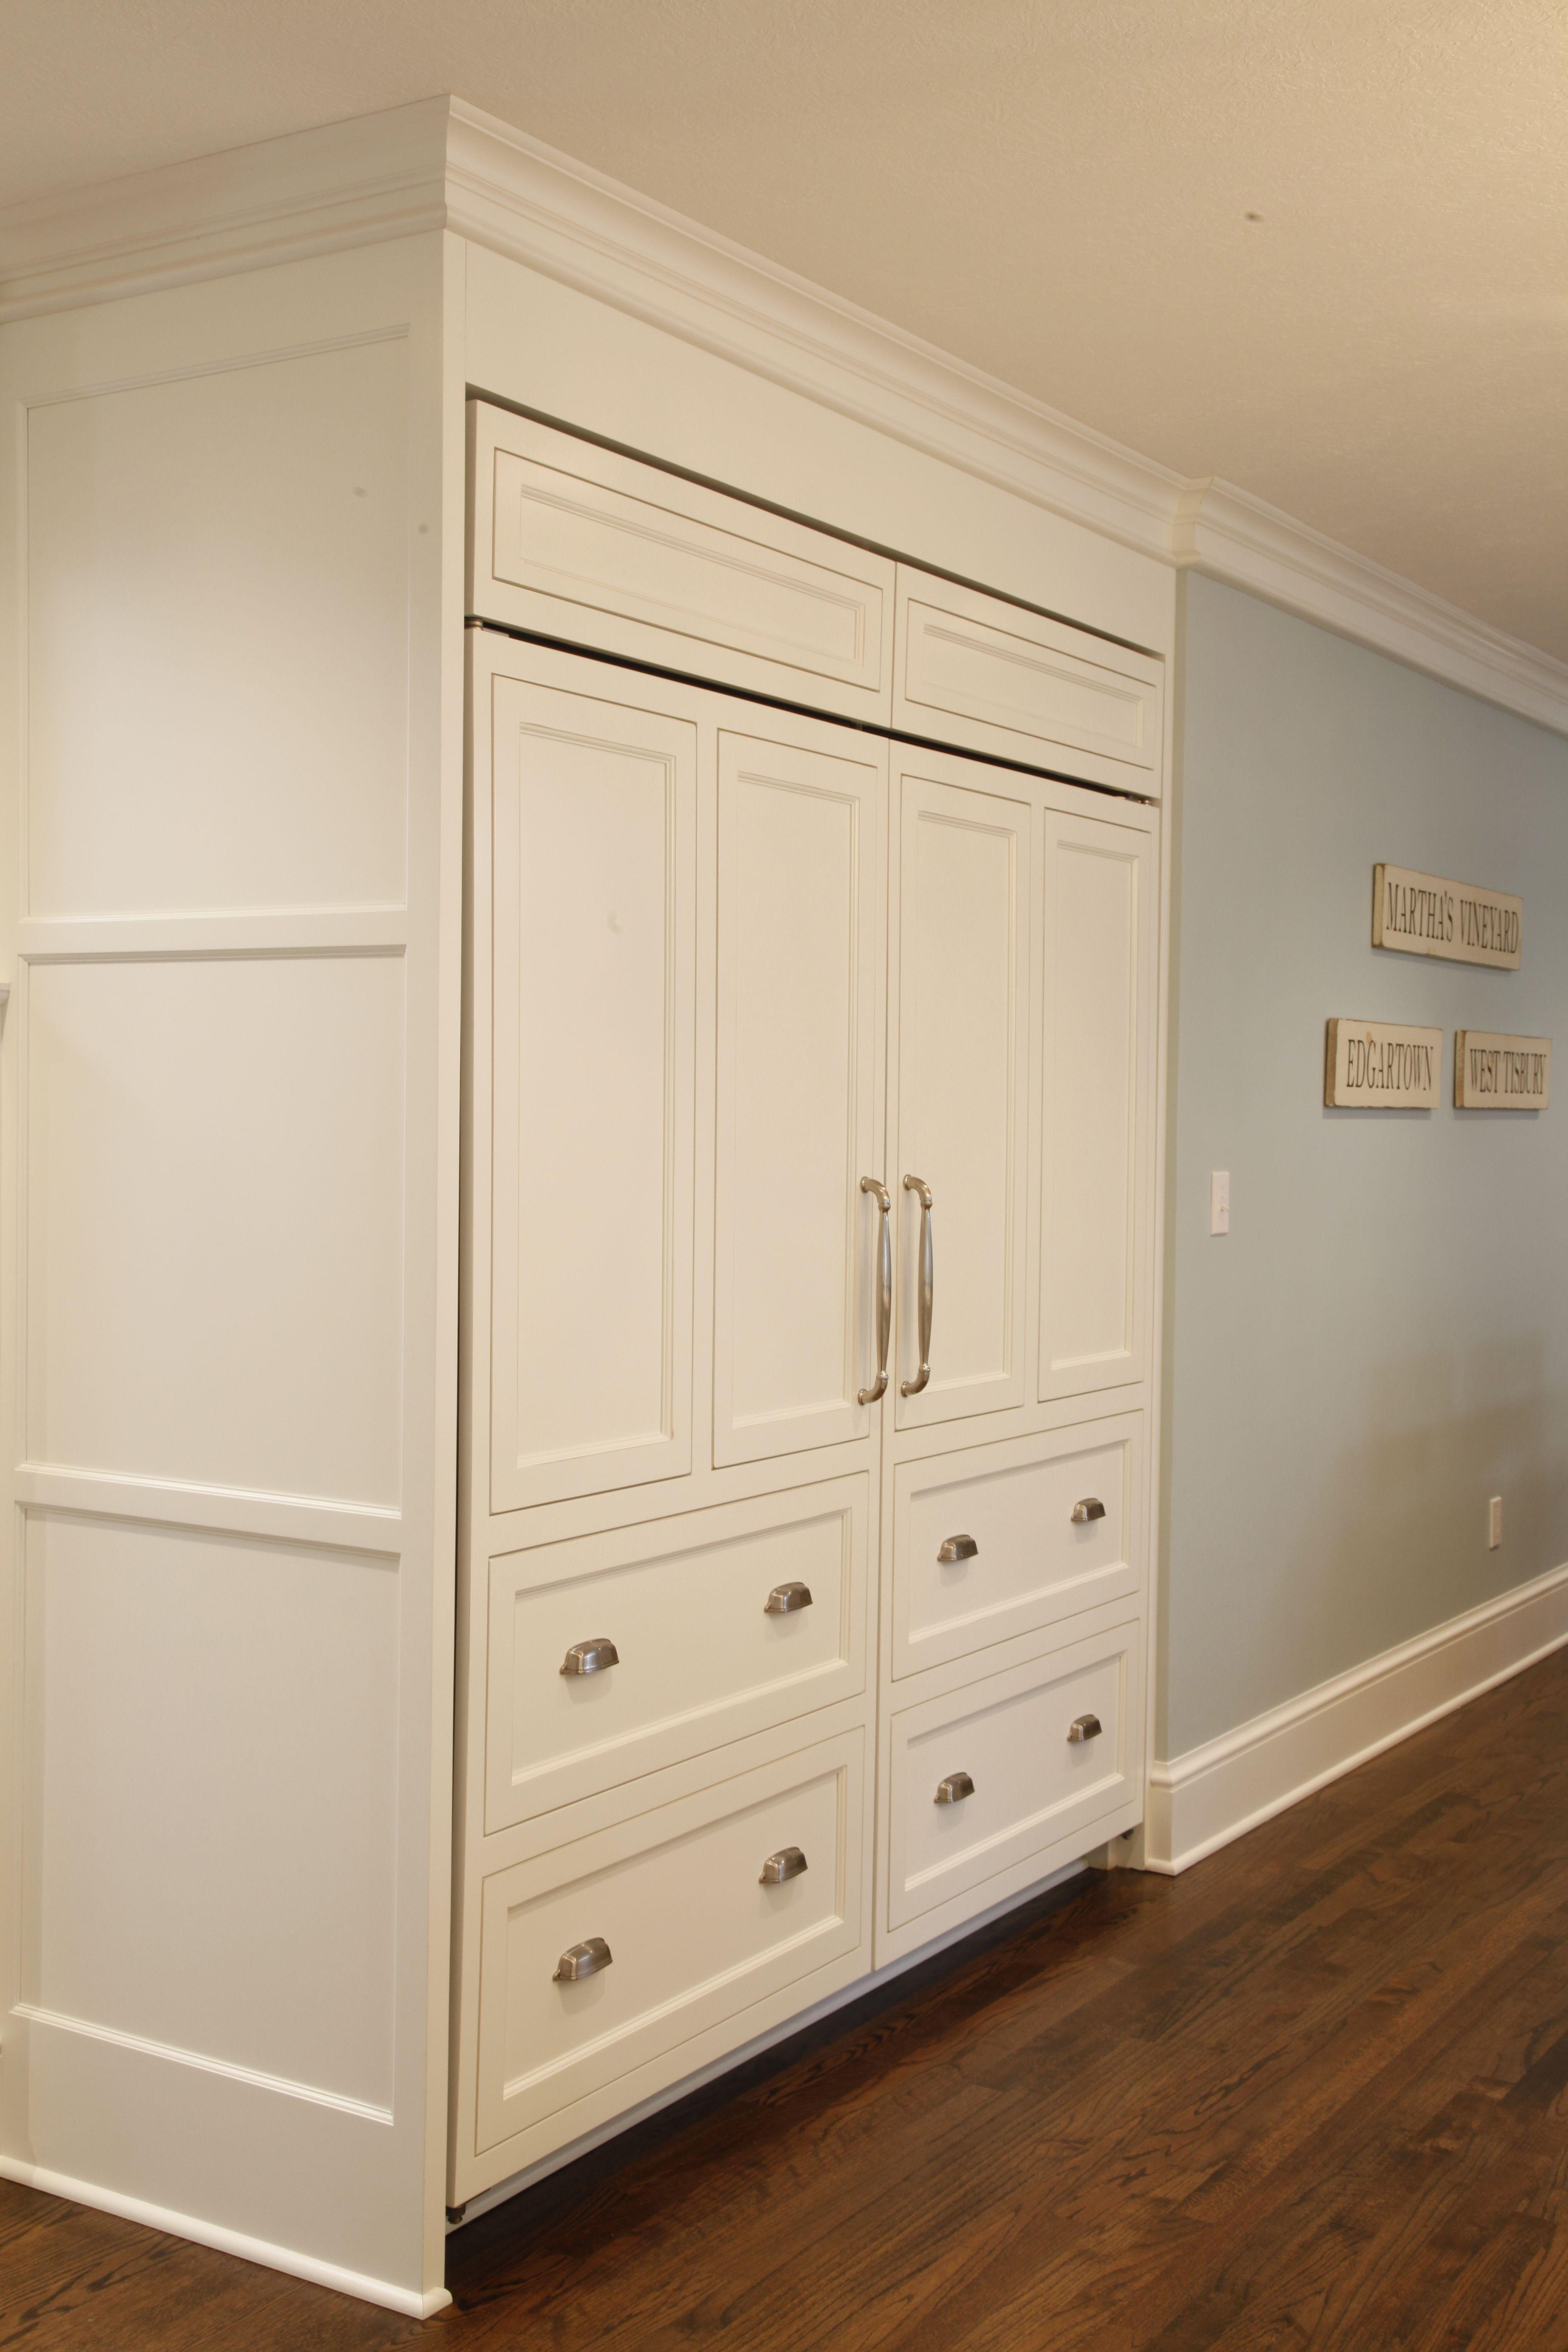 Custom Cabinet Panels Built To Cover Sub Zero Fridge Custom Cabinets Basement Remodeling Remodel